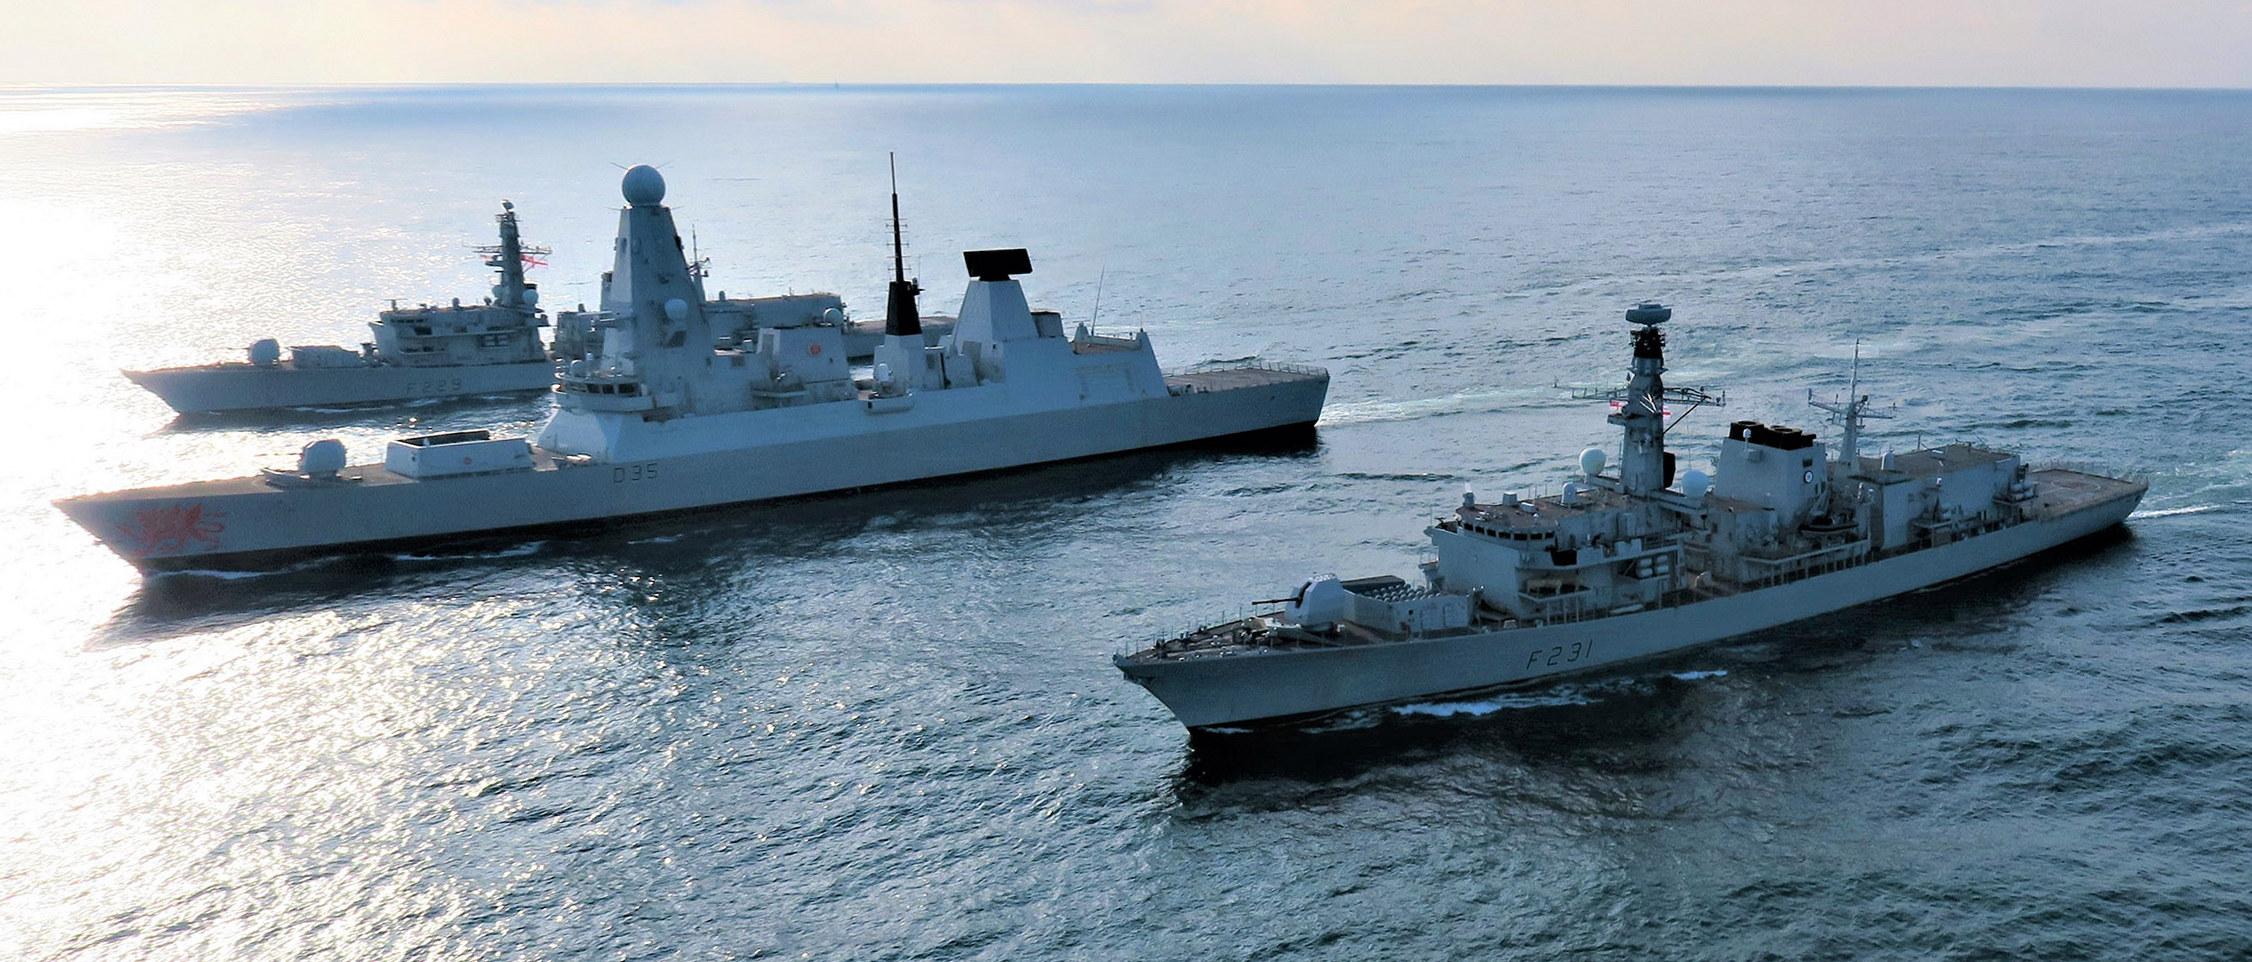 Фото: Royal Navy